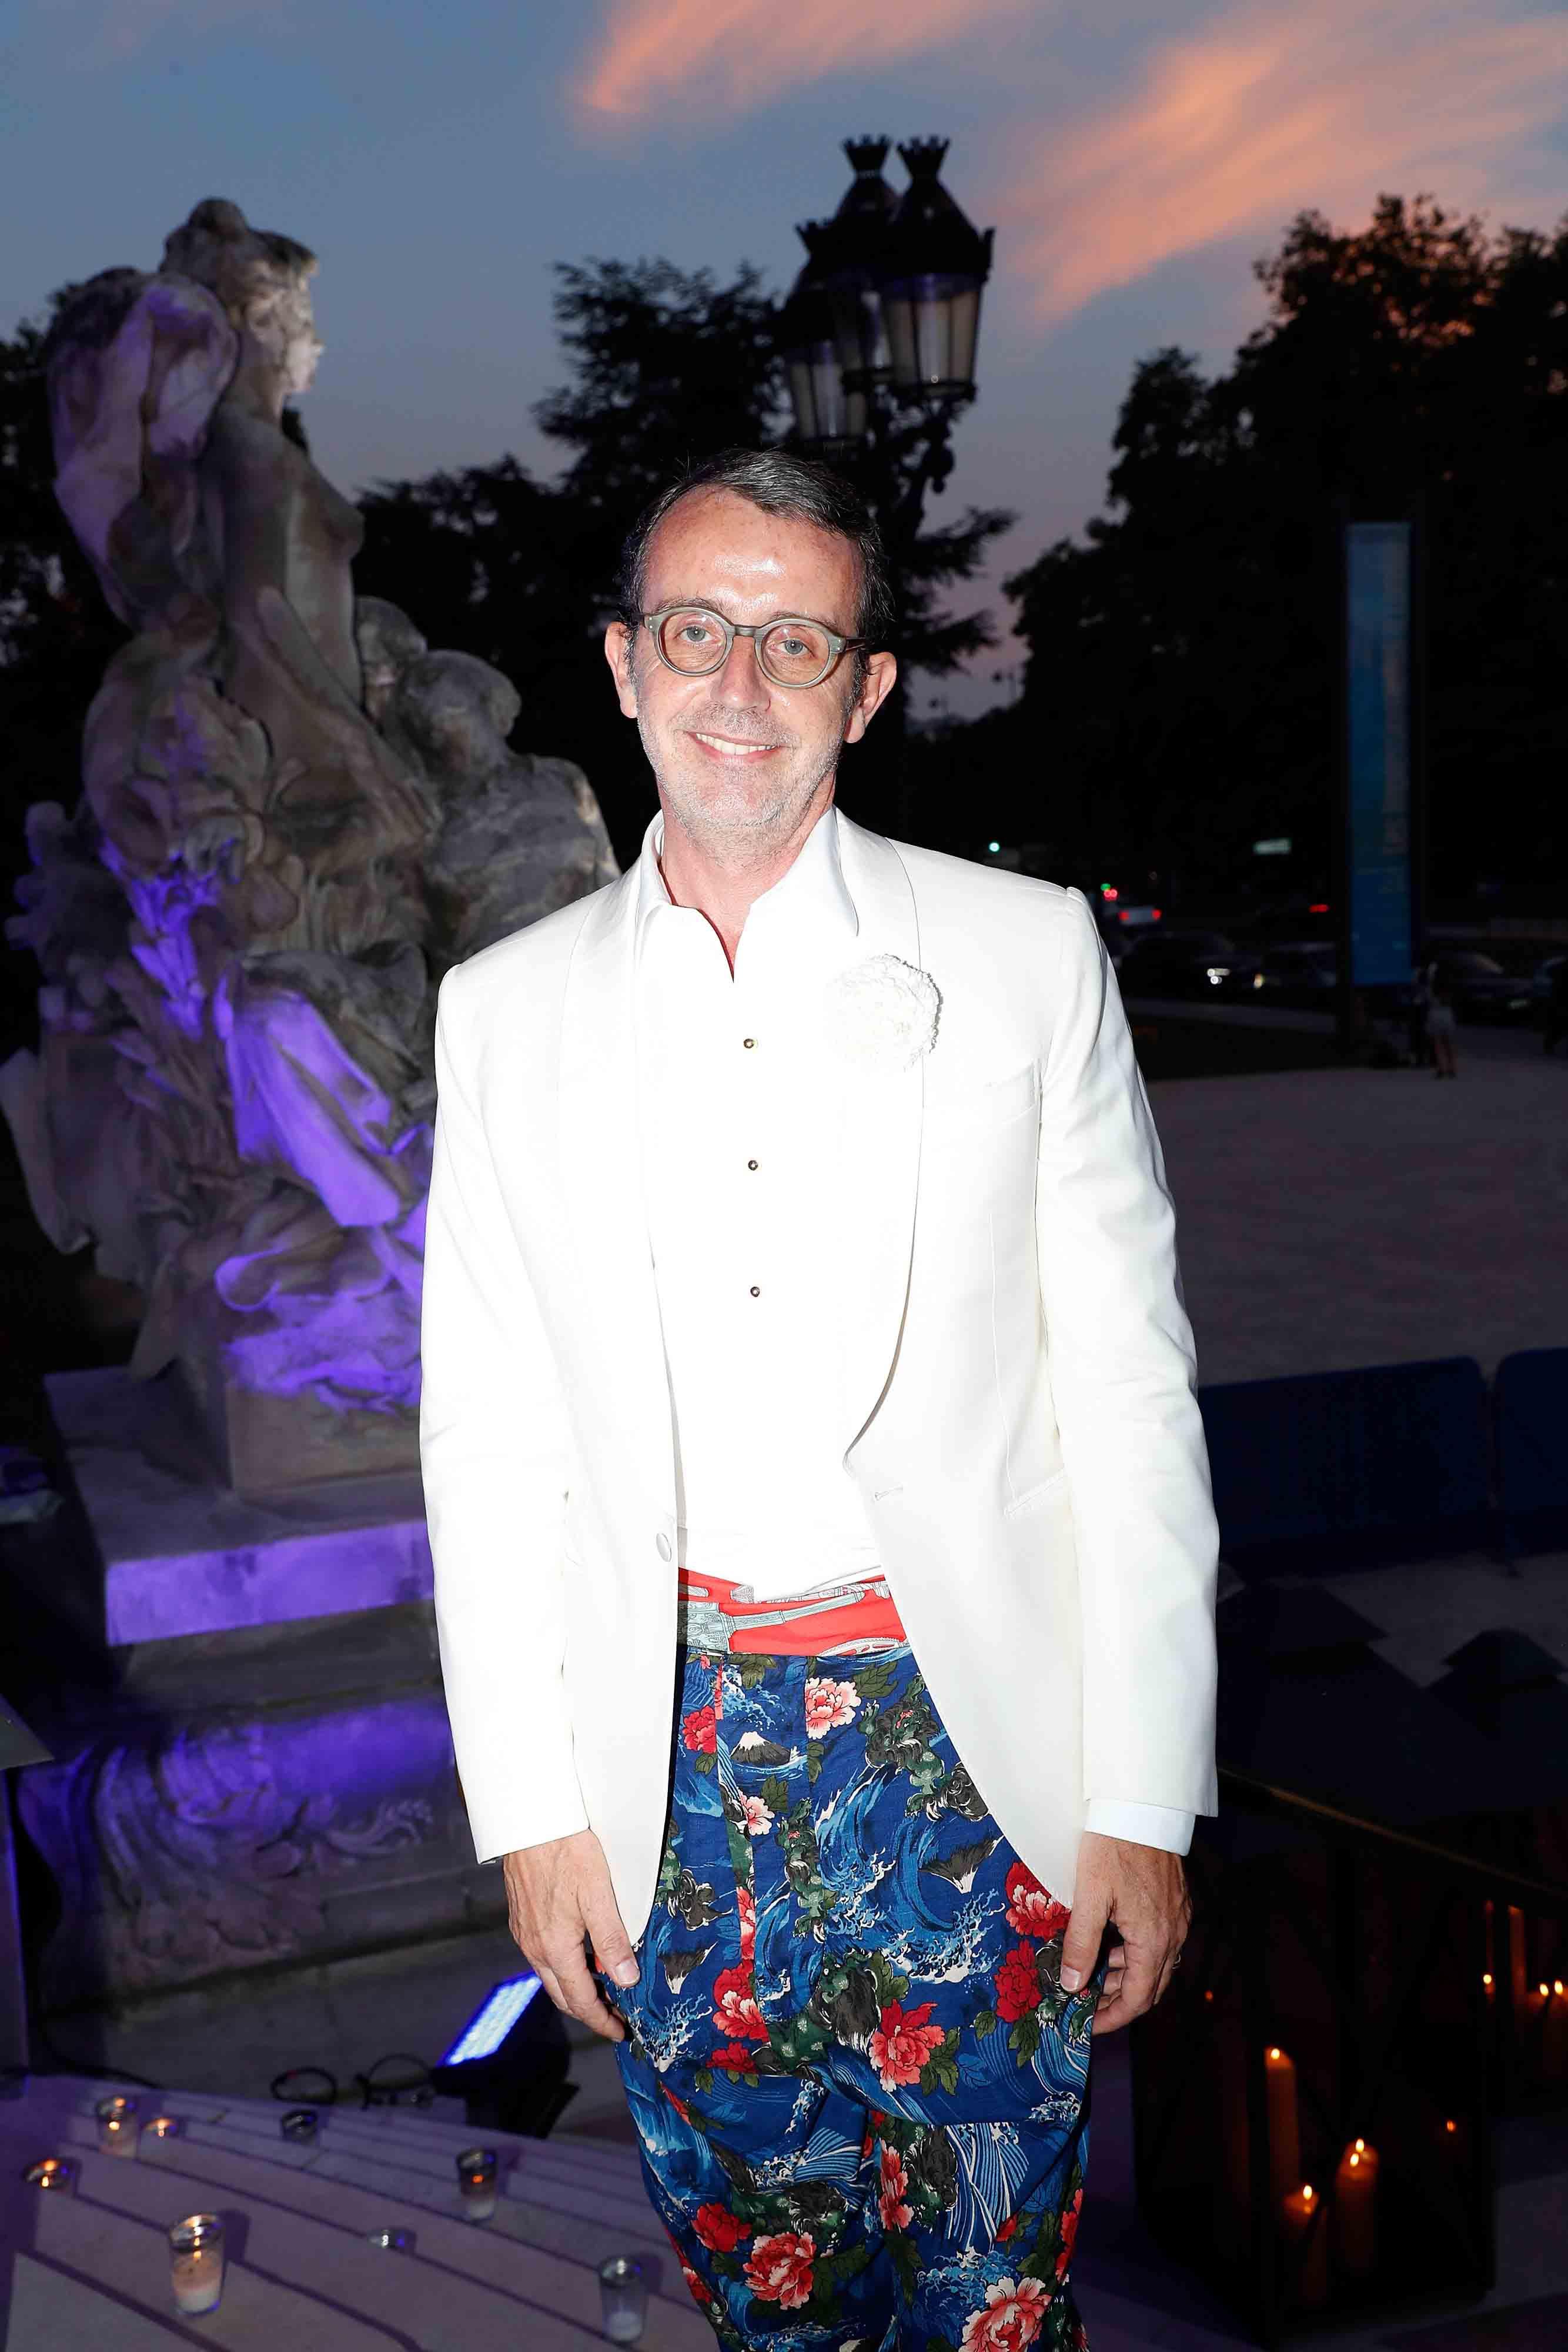 Grégoire Marot